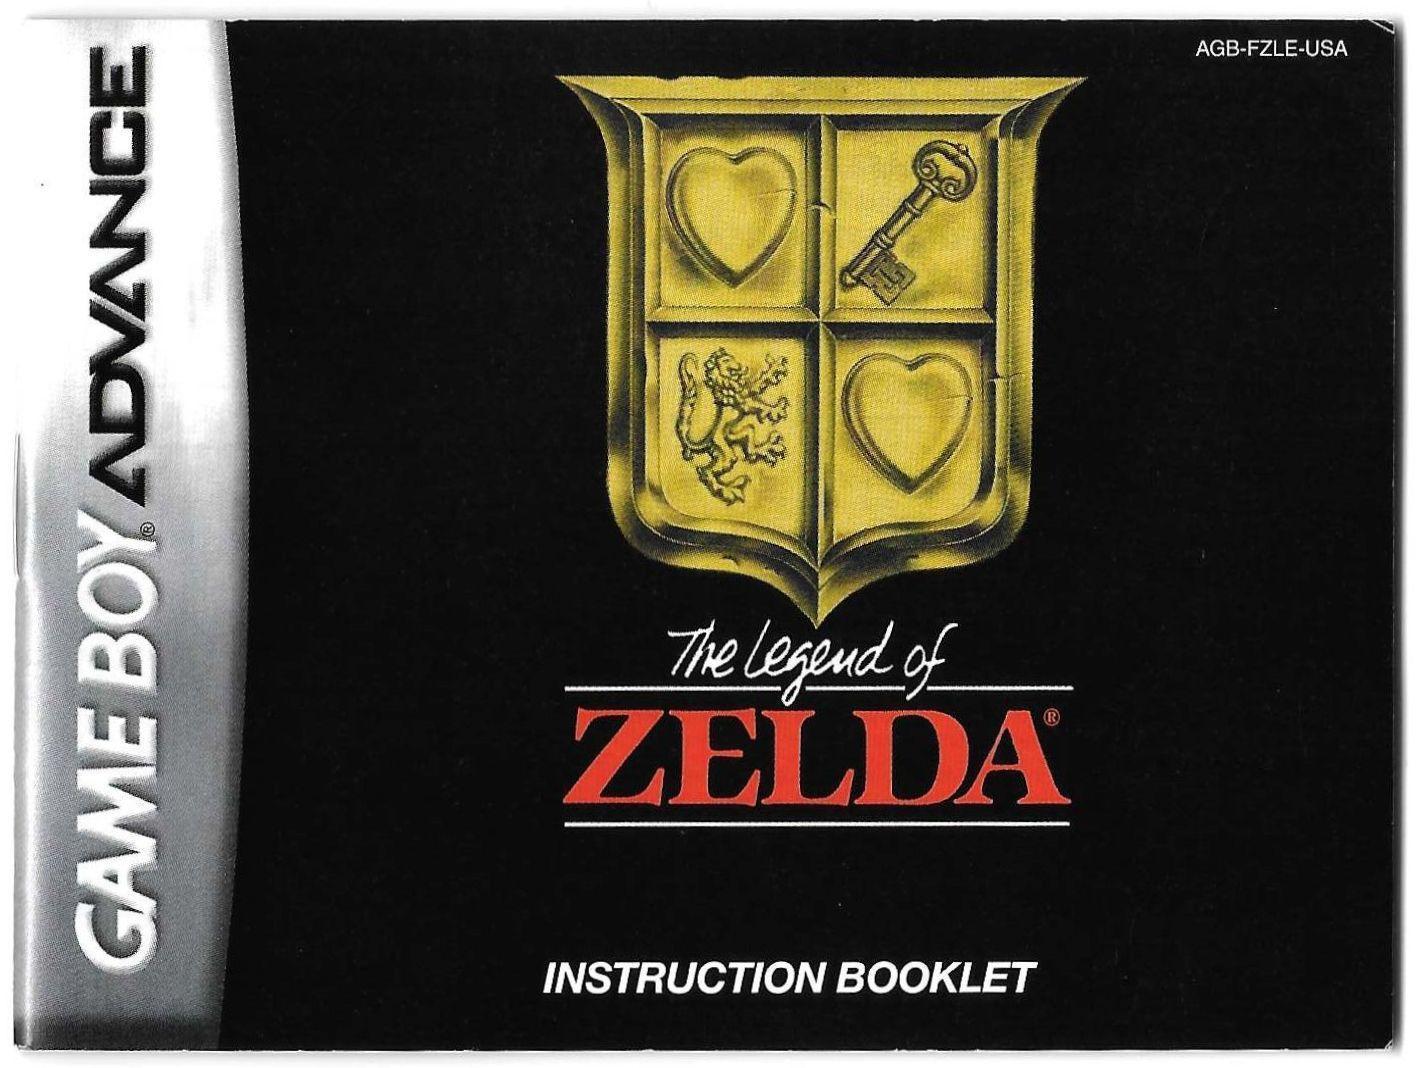 NES Classics The Legend of Zelda manual (GBA)